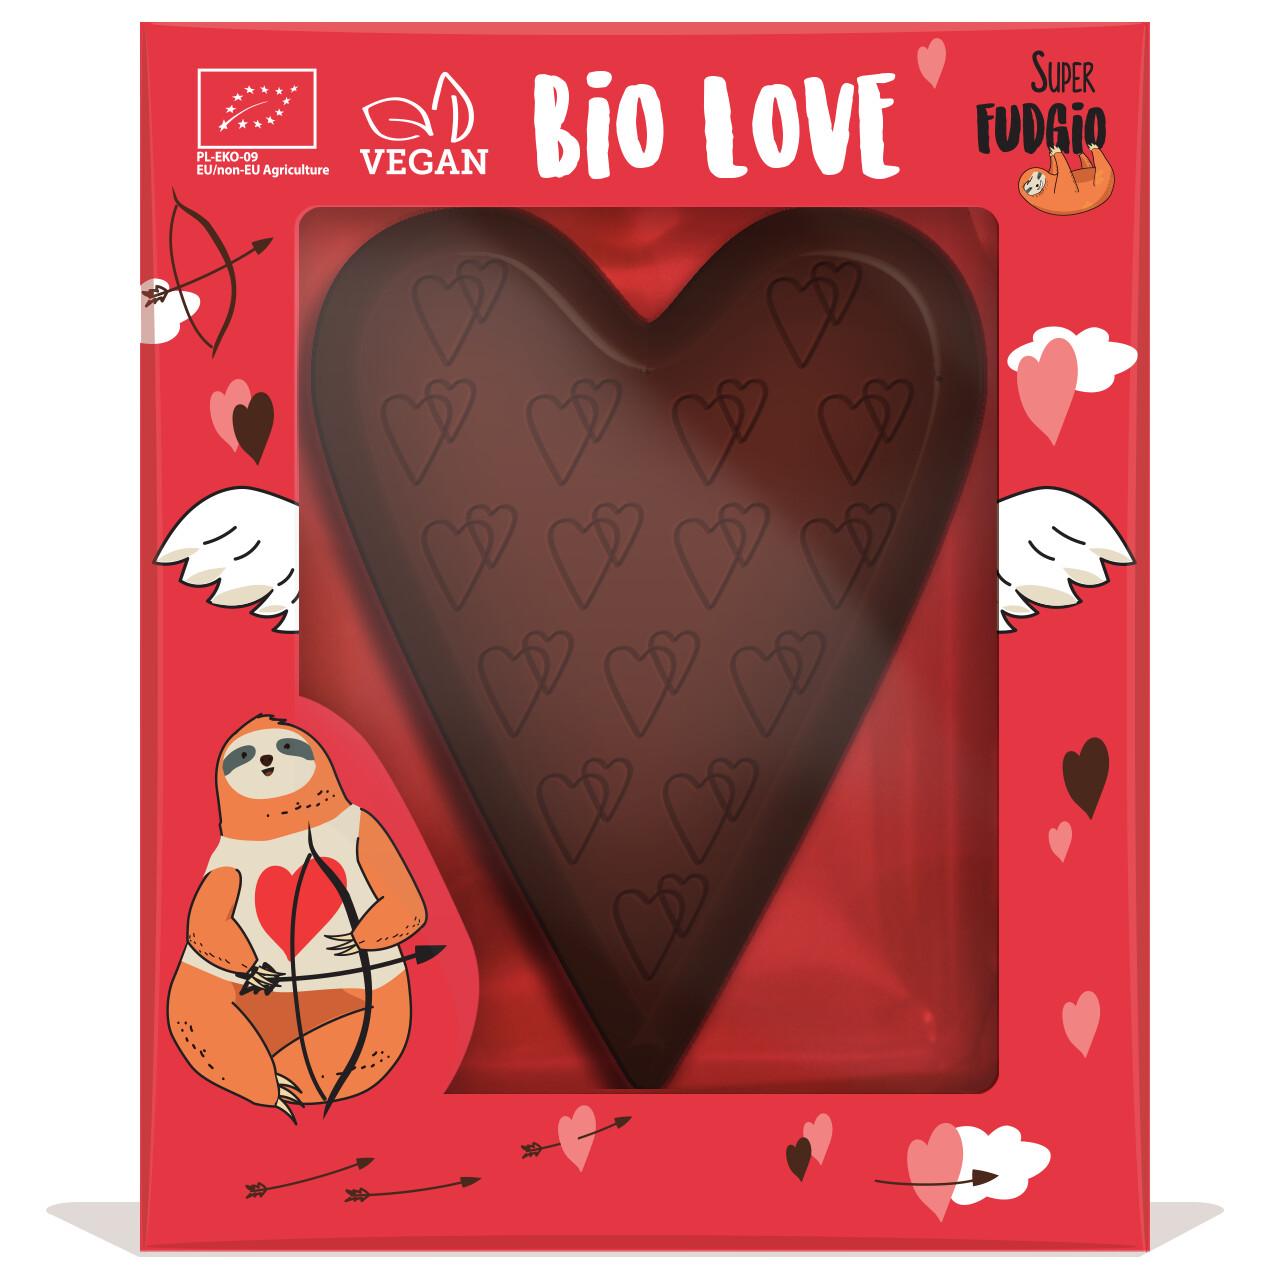 Organic Vegan Chocolate Heart in display box! 80g!